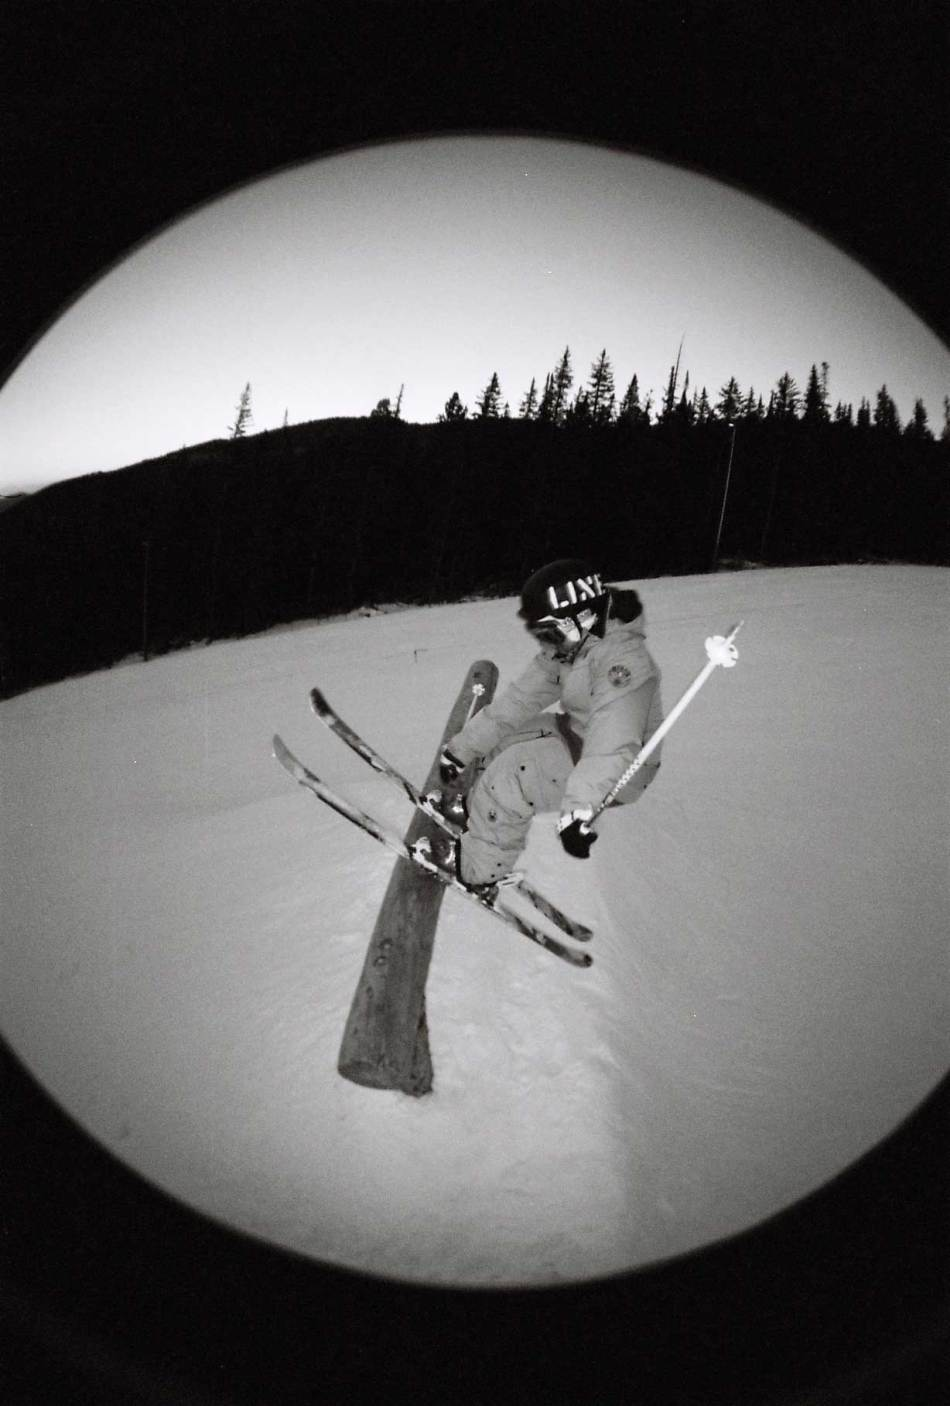 Echo Team Skier - Steph Meyer